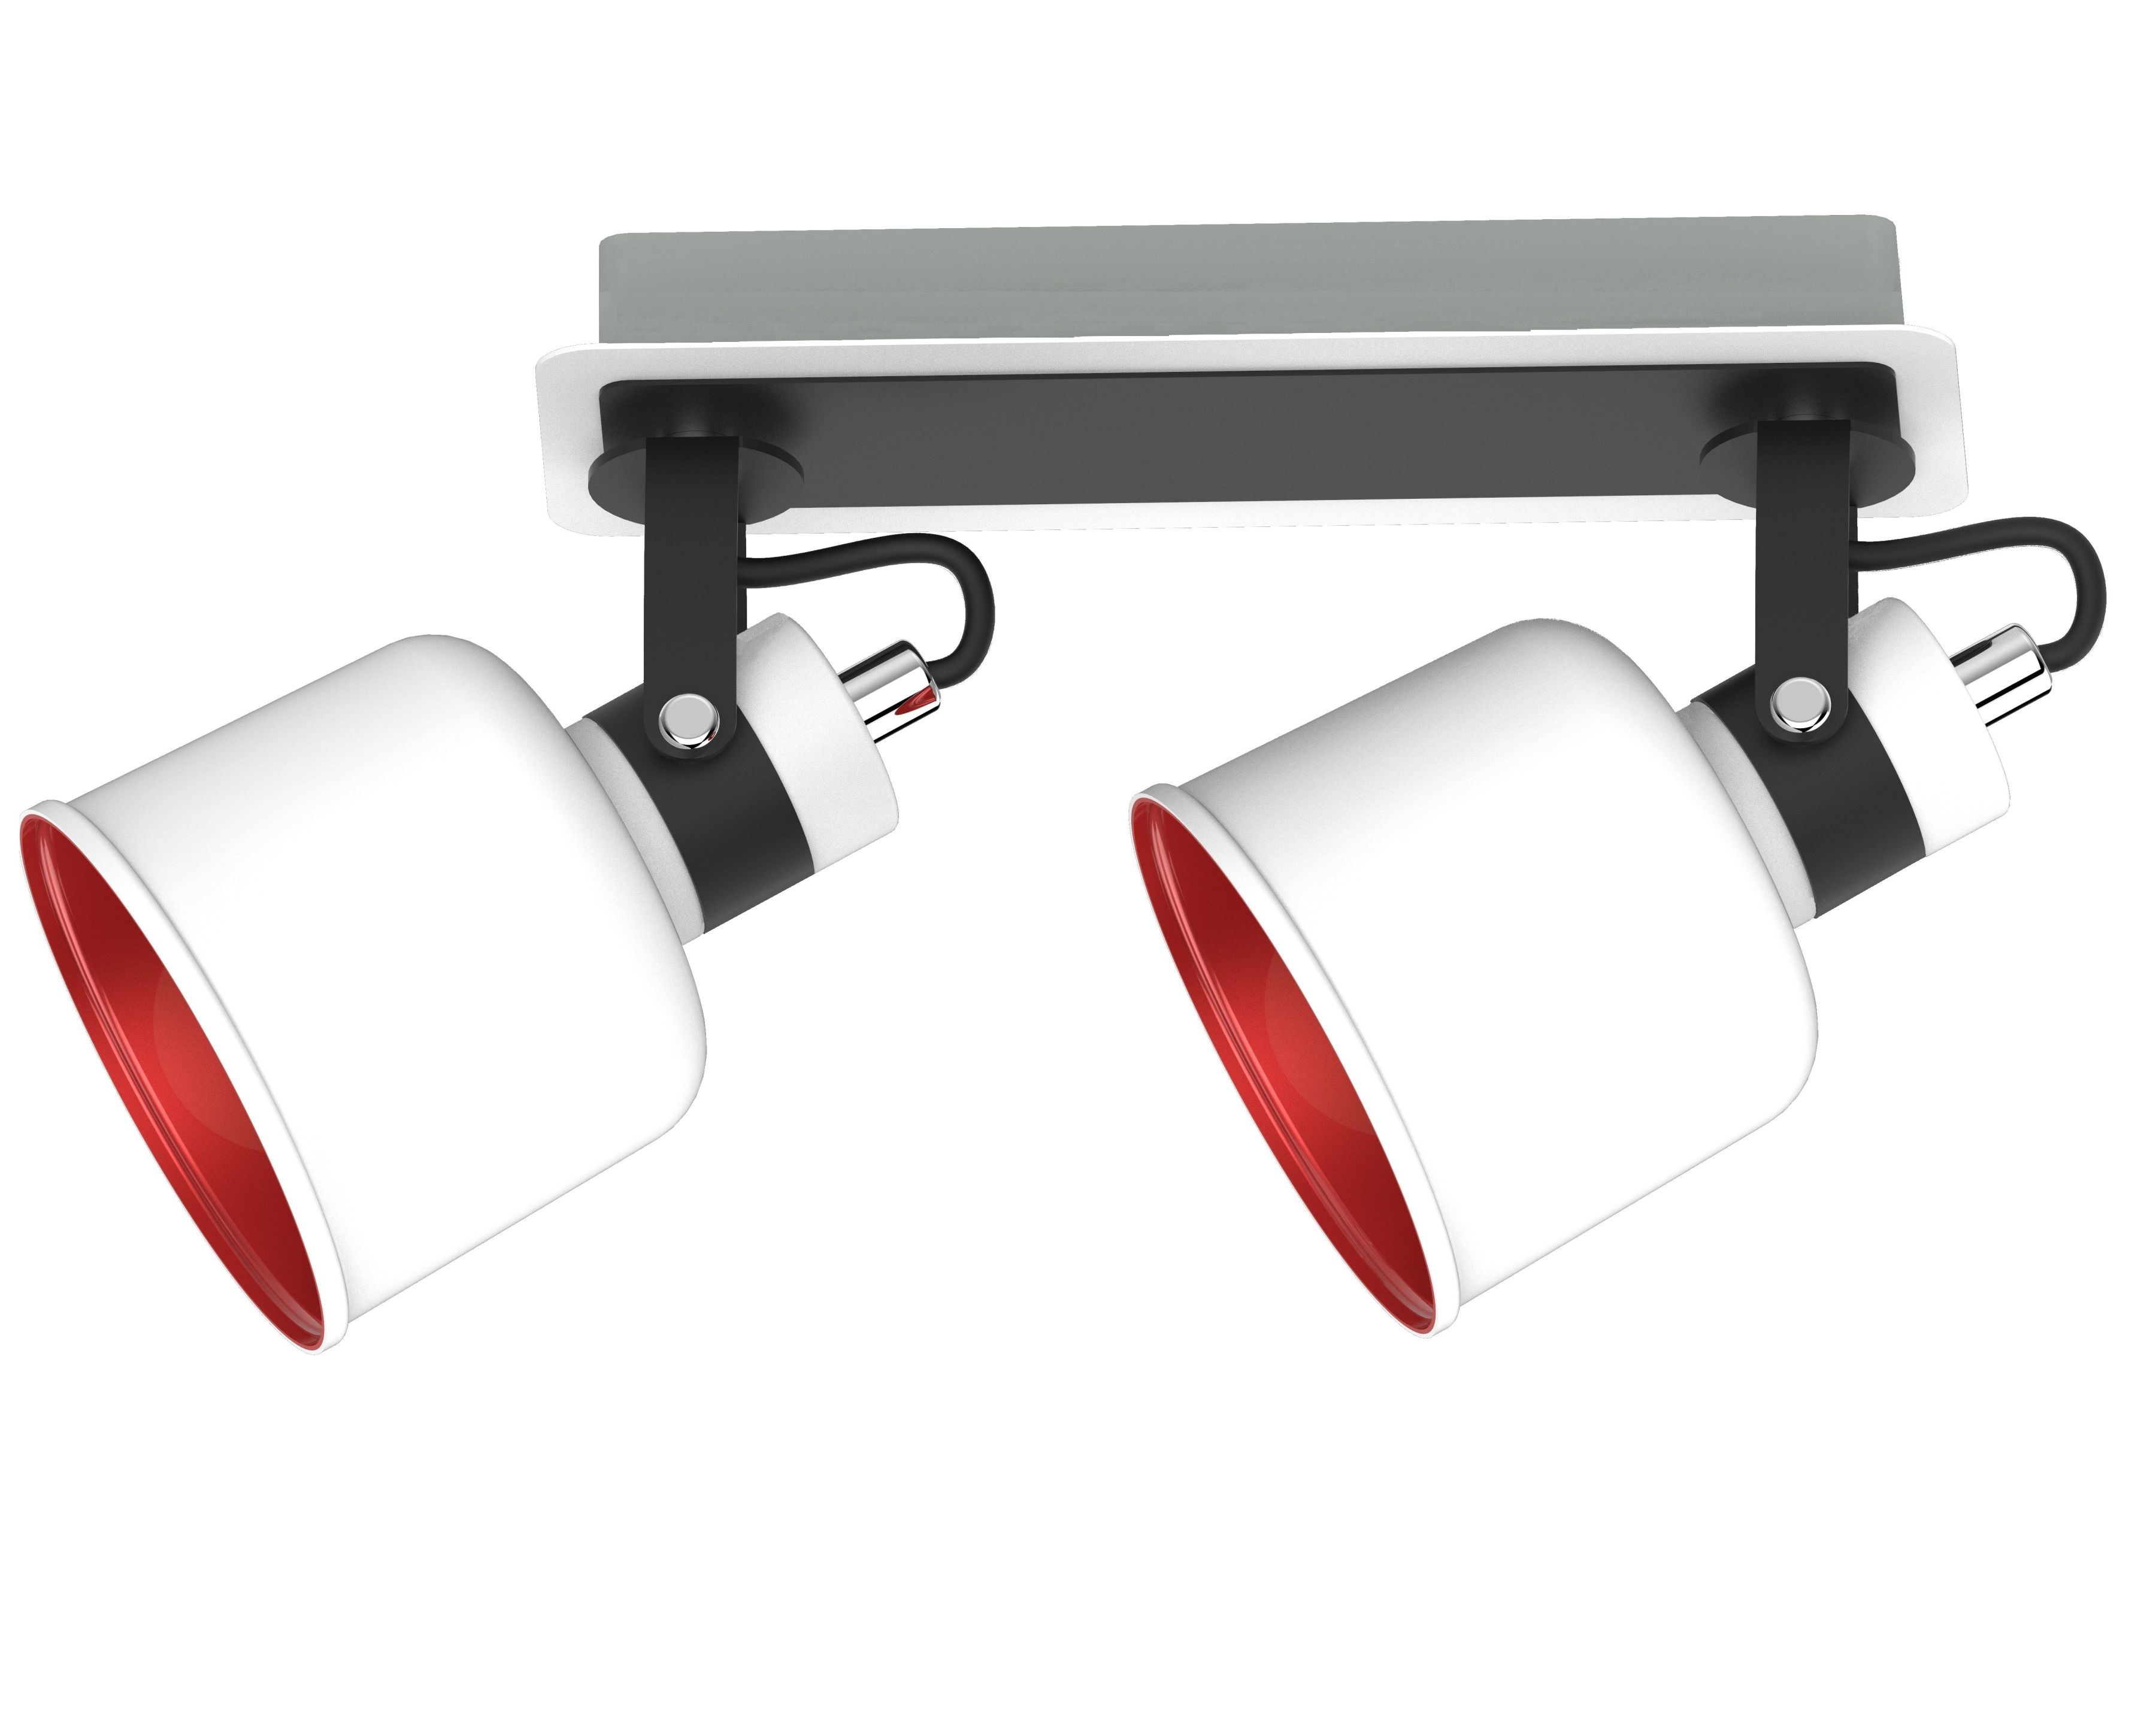 KETER LIGHTING LAMPA SUFITOWA PAKOS 1102